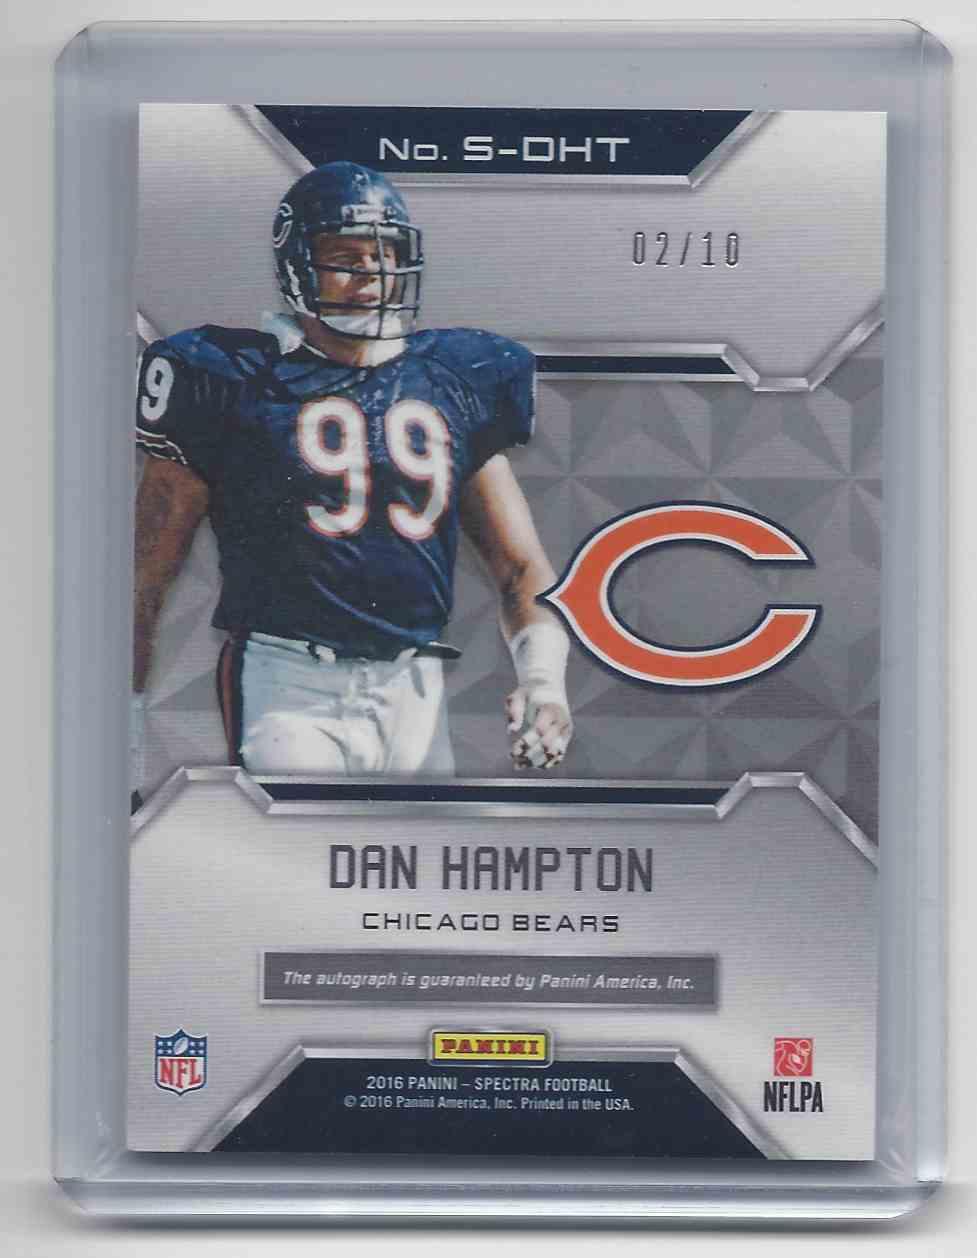 2016 Panini Spectra Dan Hampton #S-DHT card back image